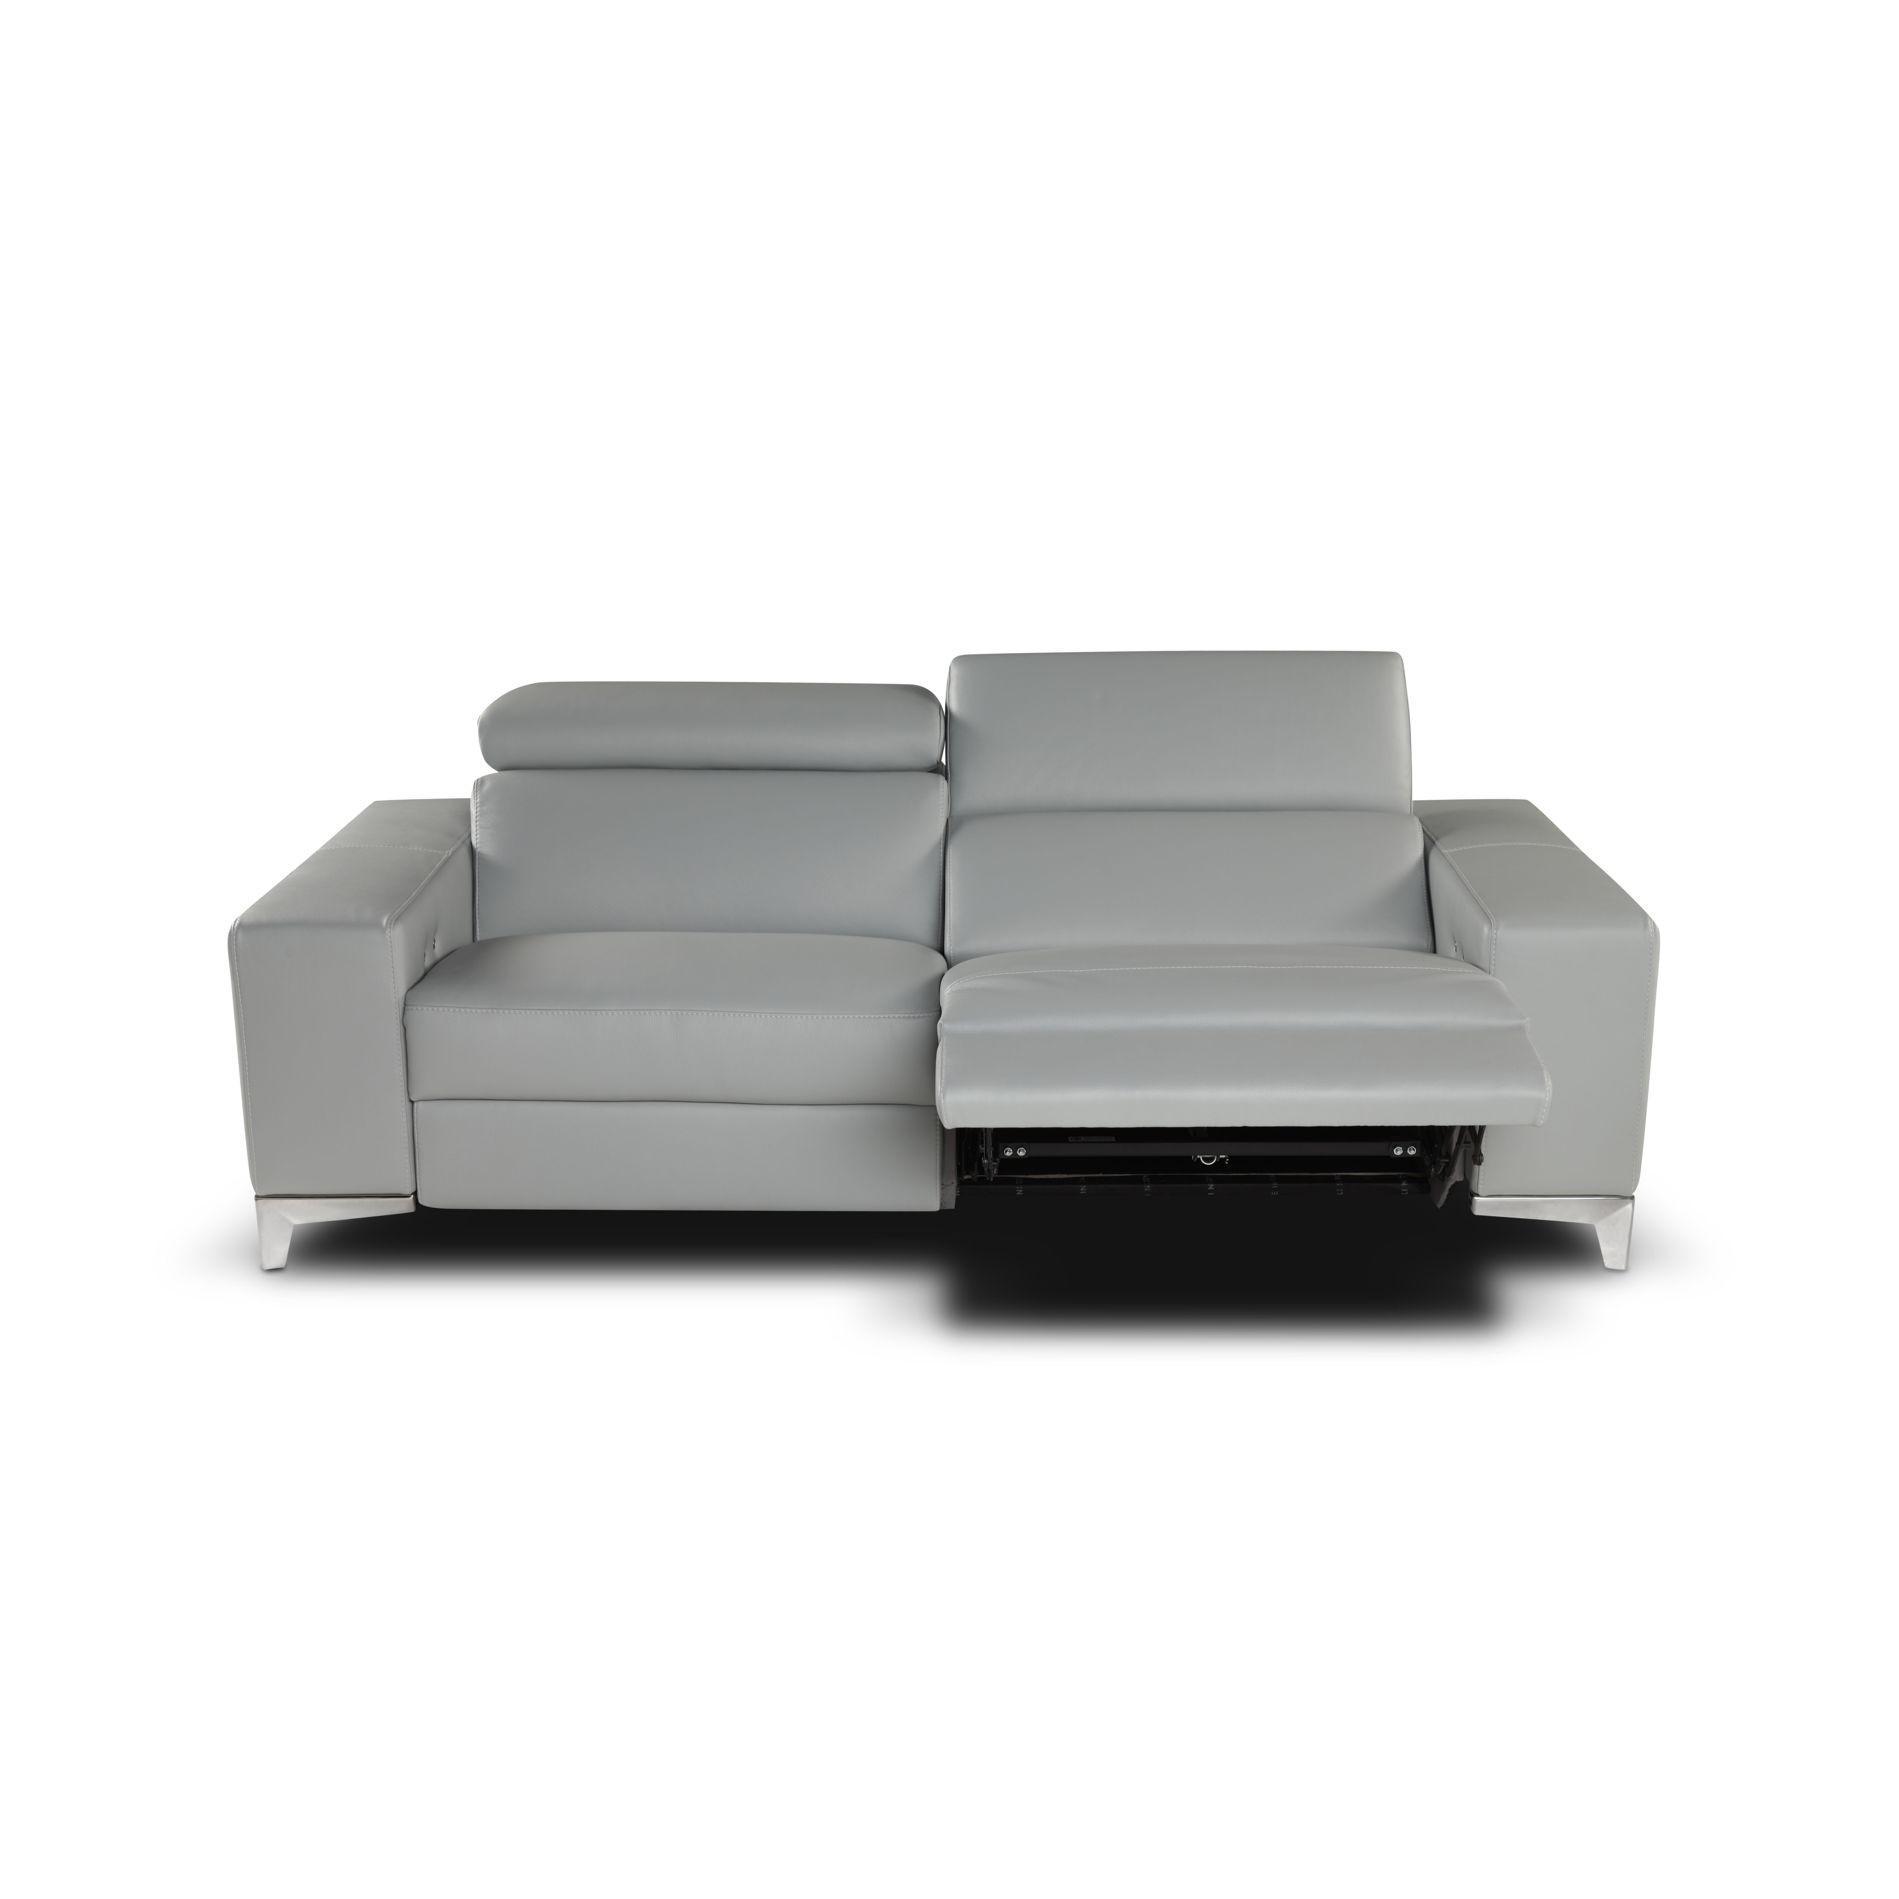 Queen Leather Sofa Set | Giuseppe&giuseppe for Italian Recliner Sofas